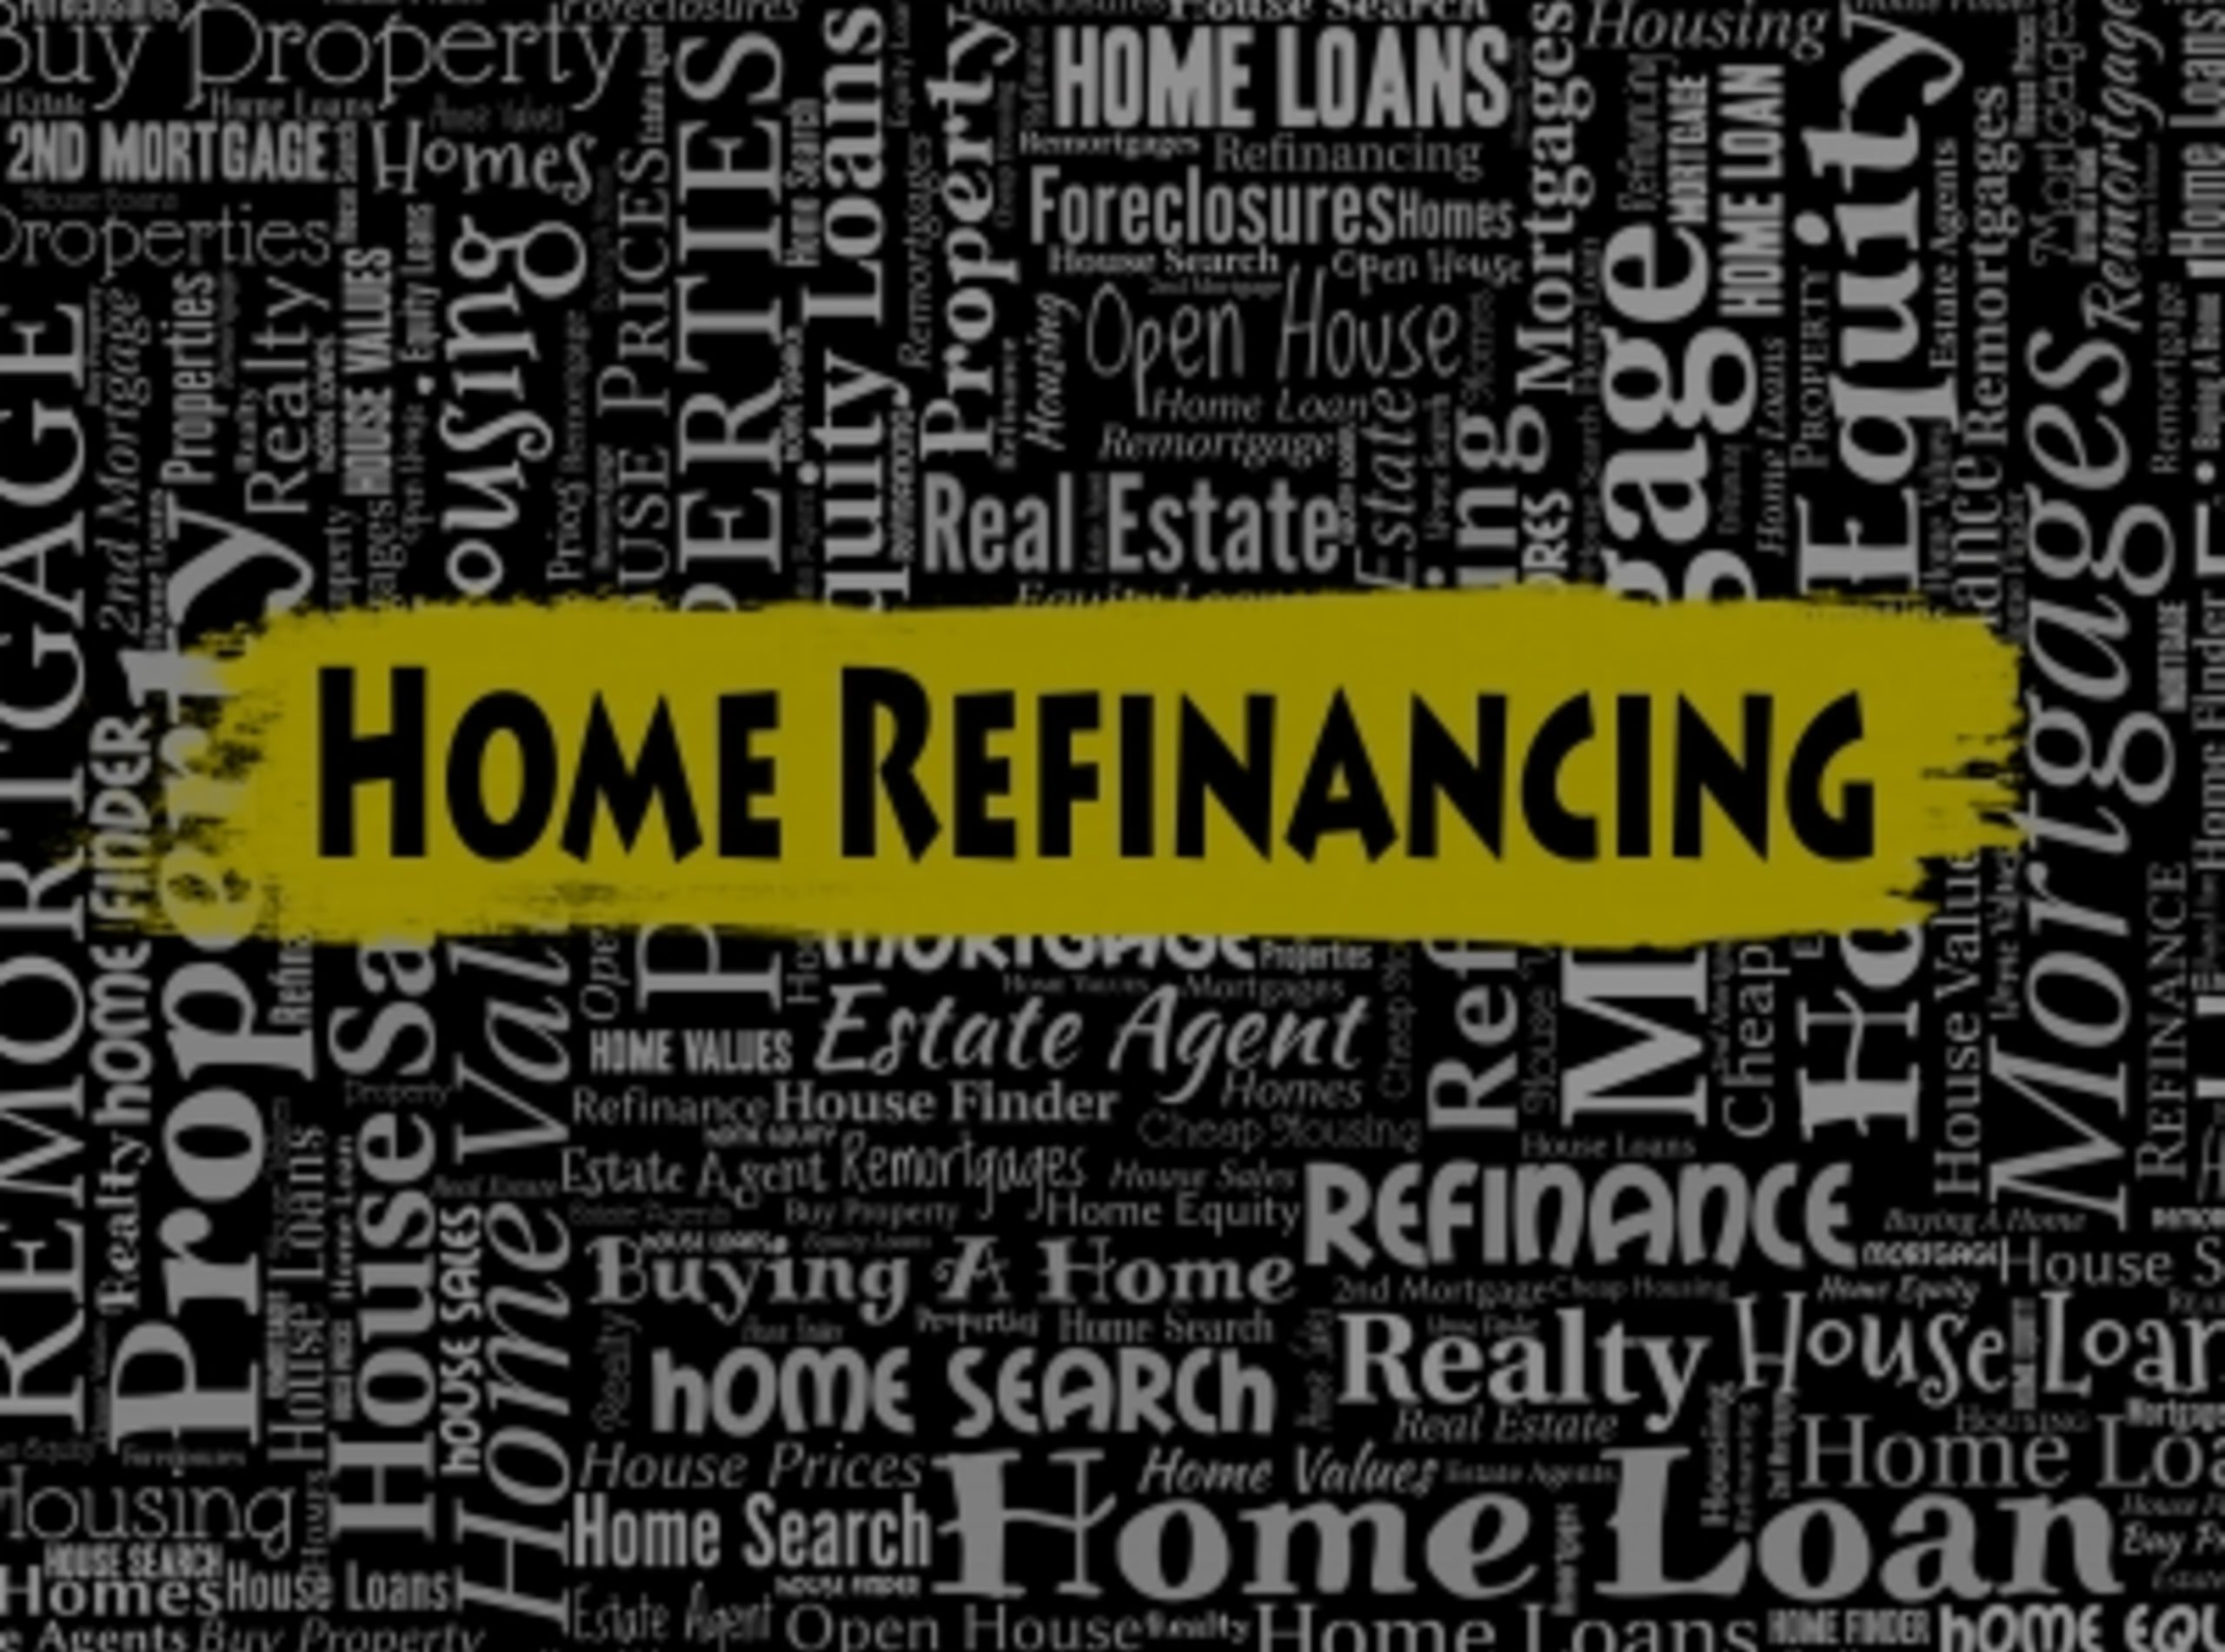 Dispelling Refinancing Myths